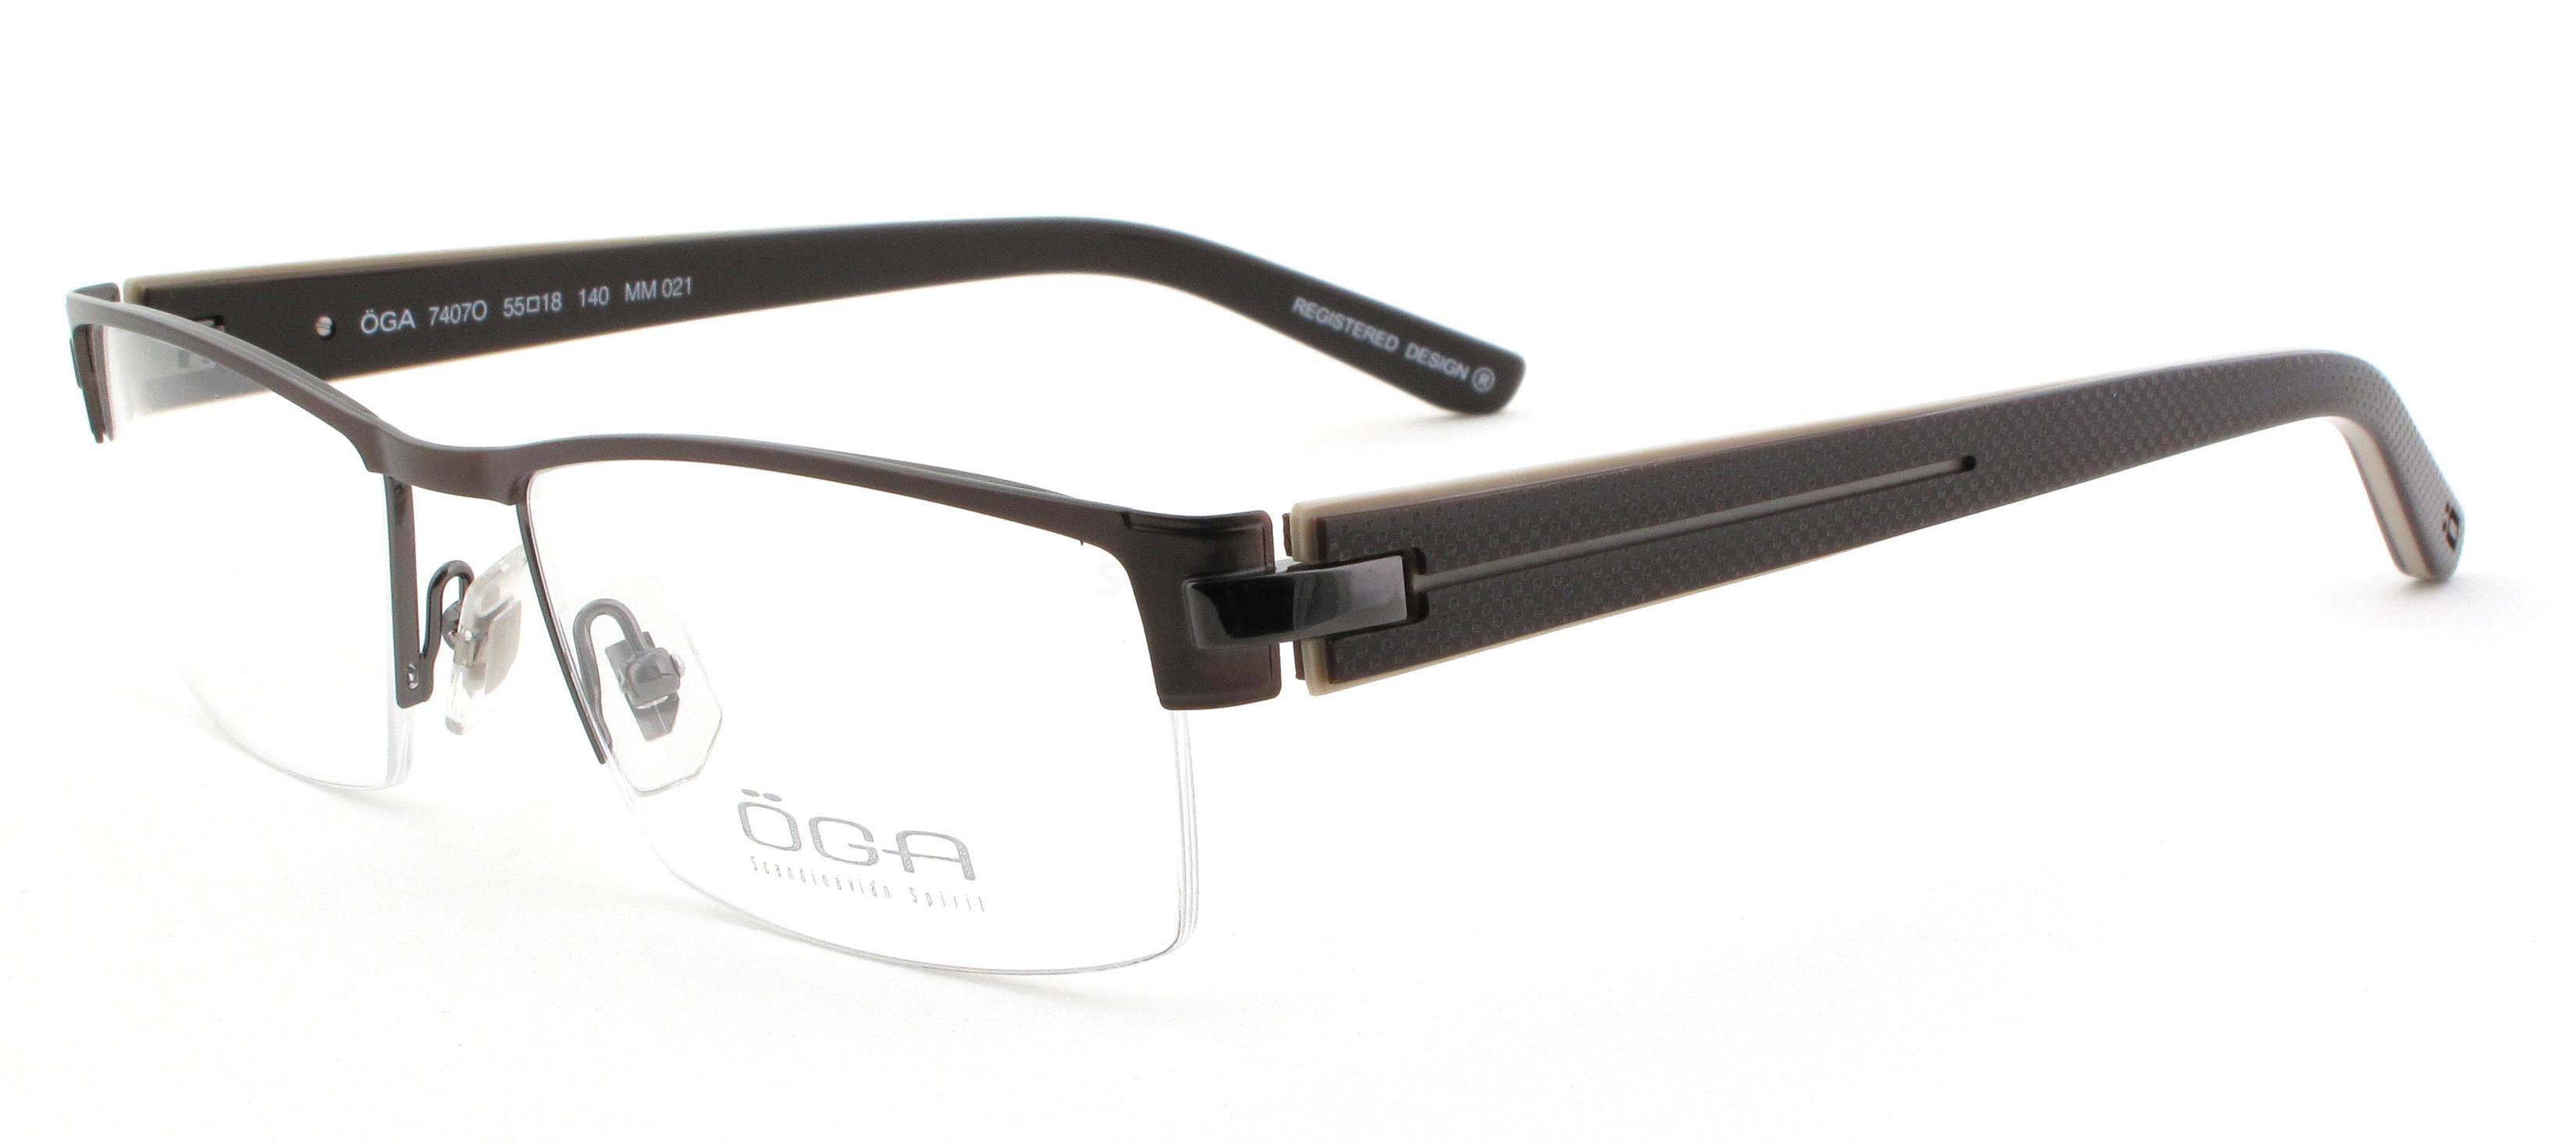 MM021 7407O TALVAC 1 Glasses, ÖGA Scandinavian Spirit